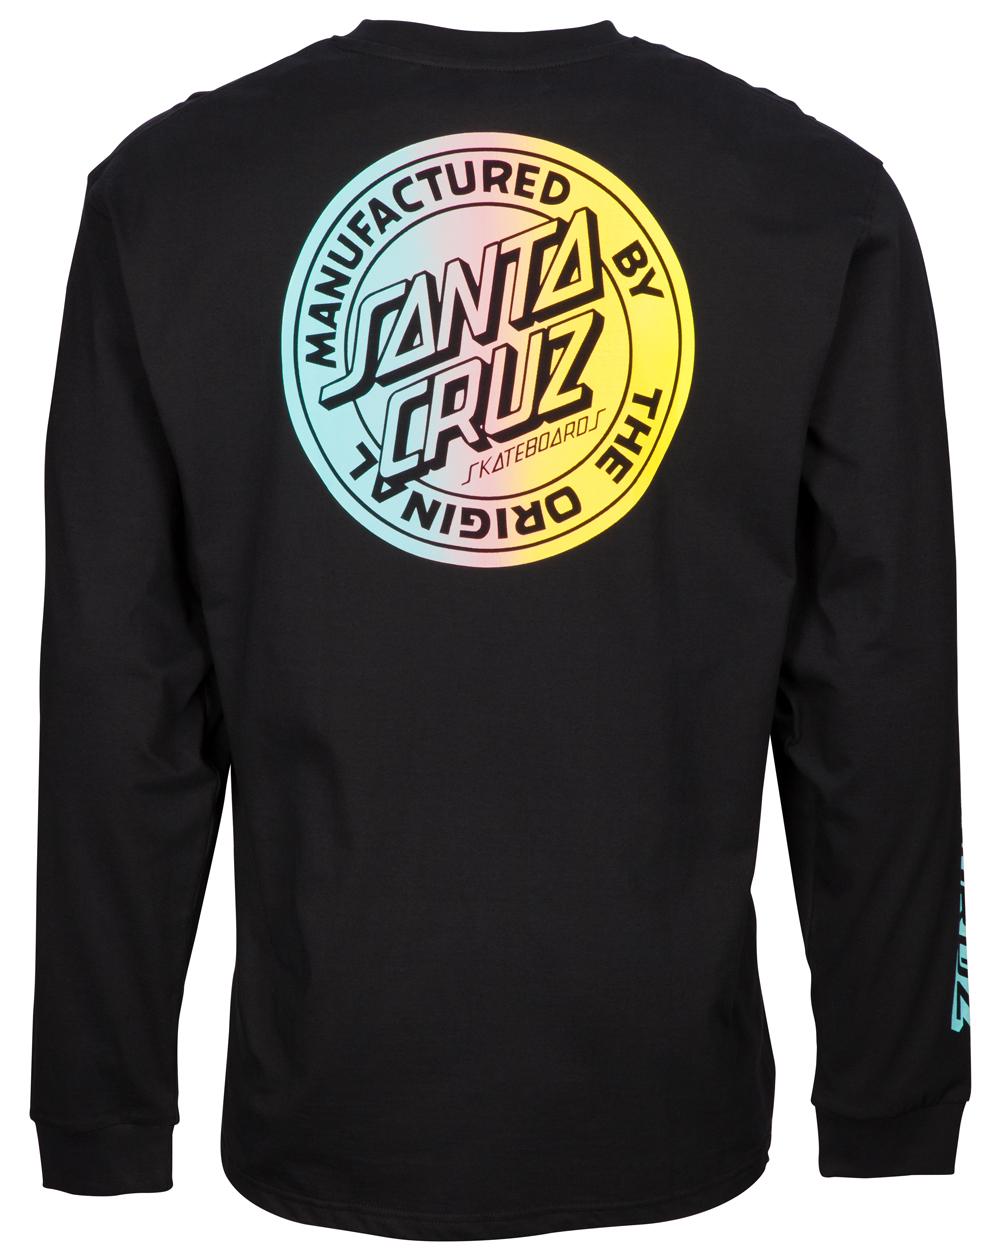 Santa Cruz MFG Dot Fade Camisetas de Manga Larga para Hombre Black